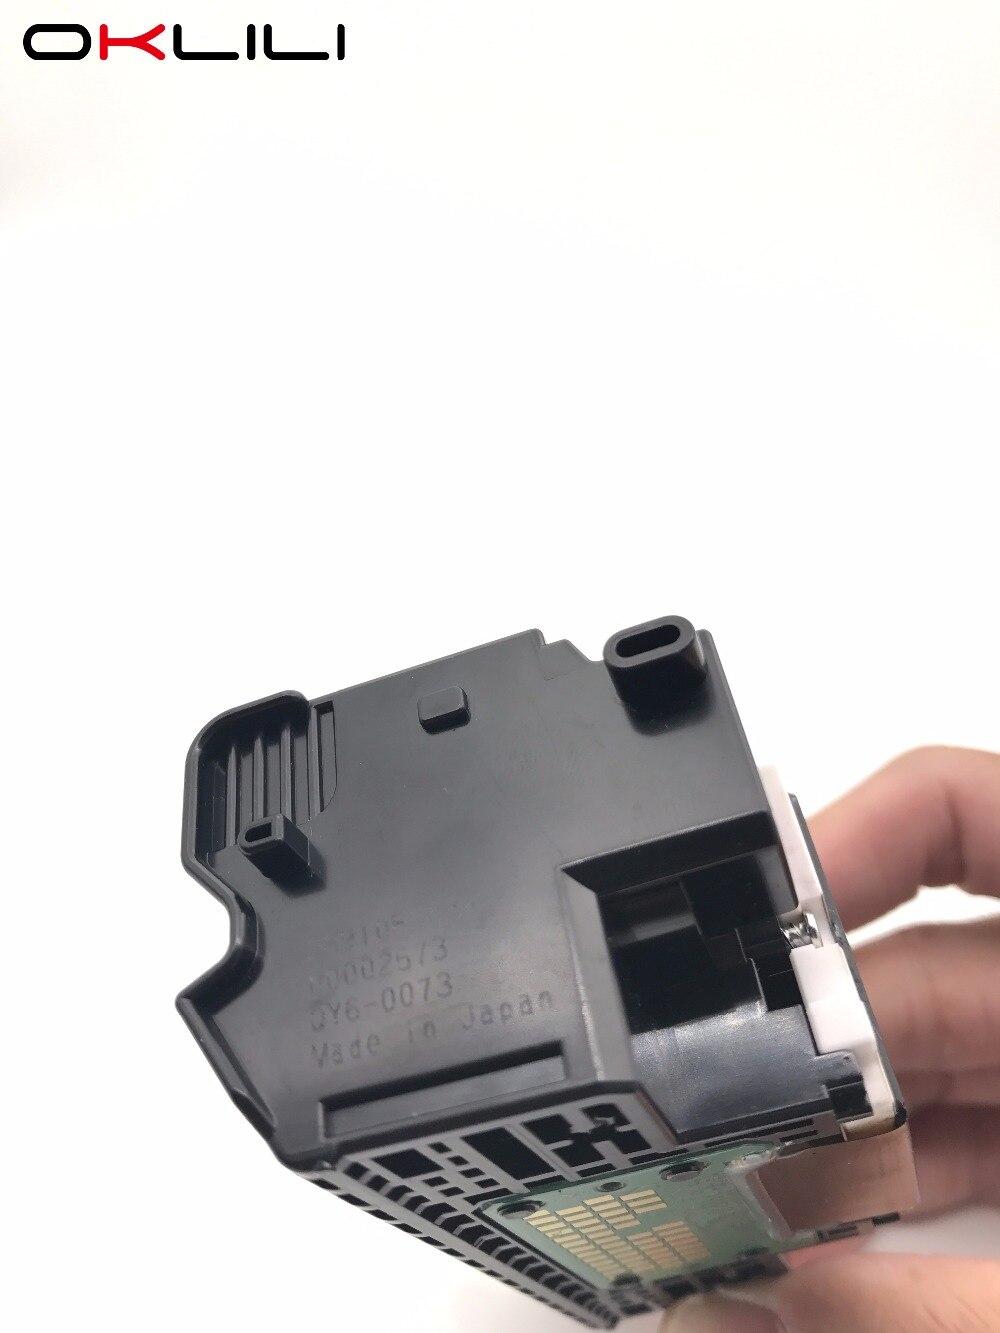 Image 5 - Печатающая головка QY6 0073 для Canon iP3600 iP3680 MP540 MP550  MP560 MP568 MP620 MX860 MX868 MX870 MX878 MG5140 MG5150 MG5180print  headqy6-0073 printheadprinthead qy6-0073